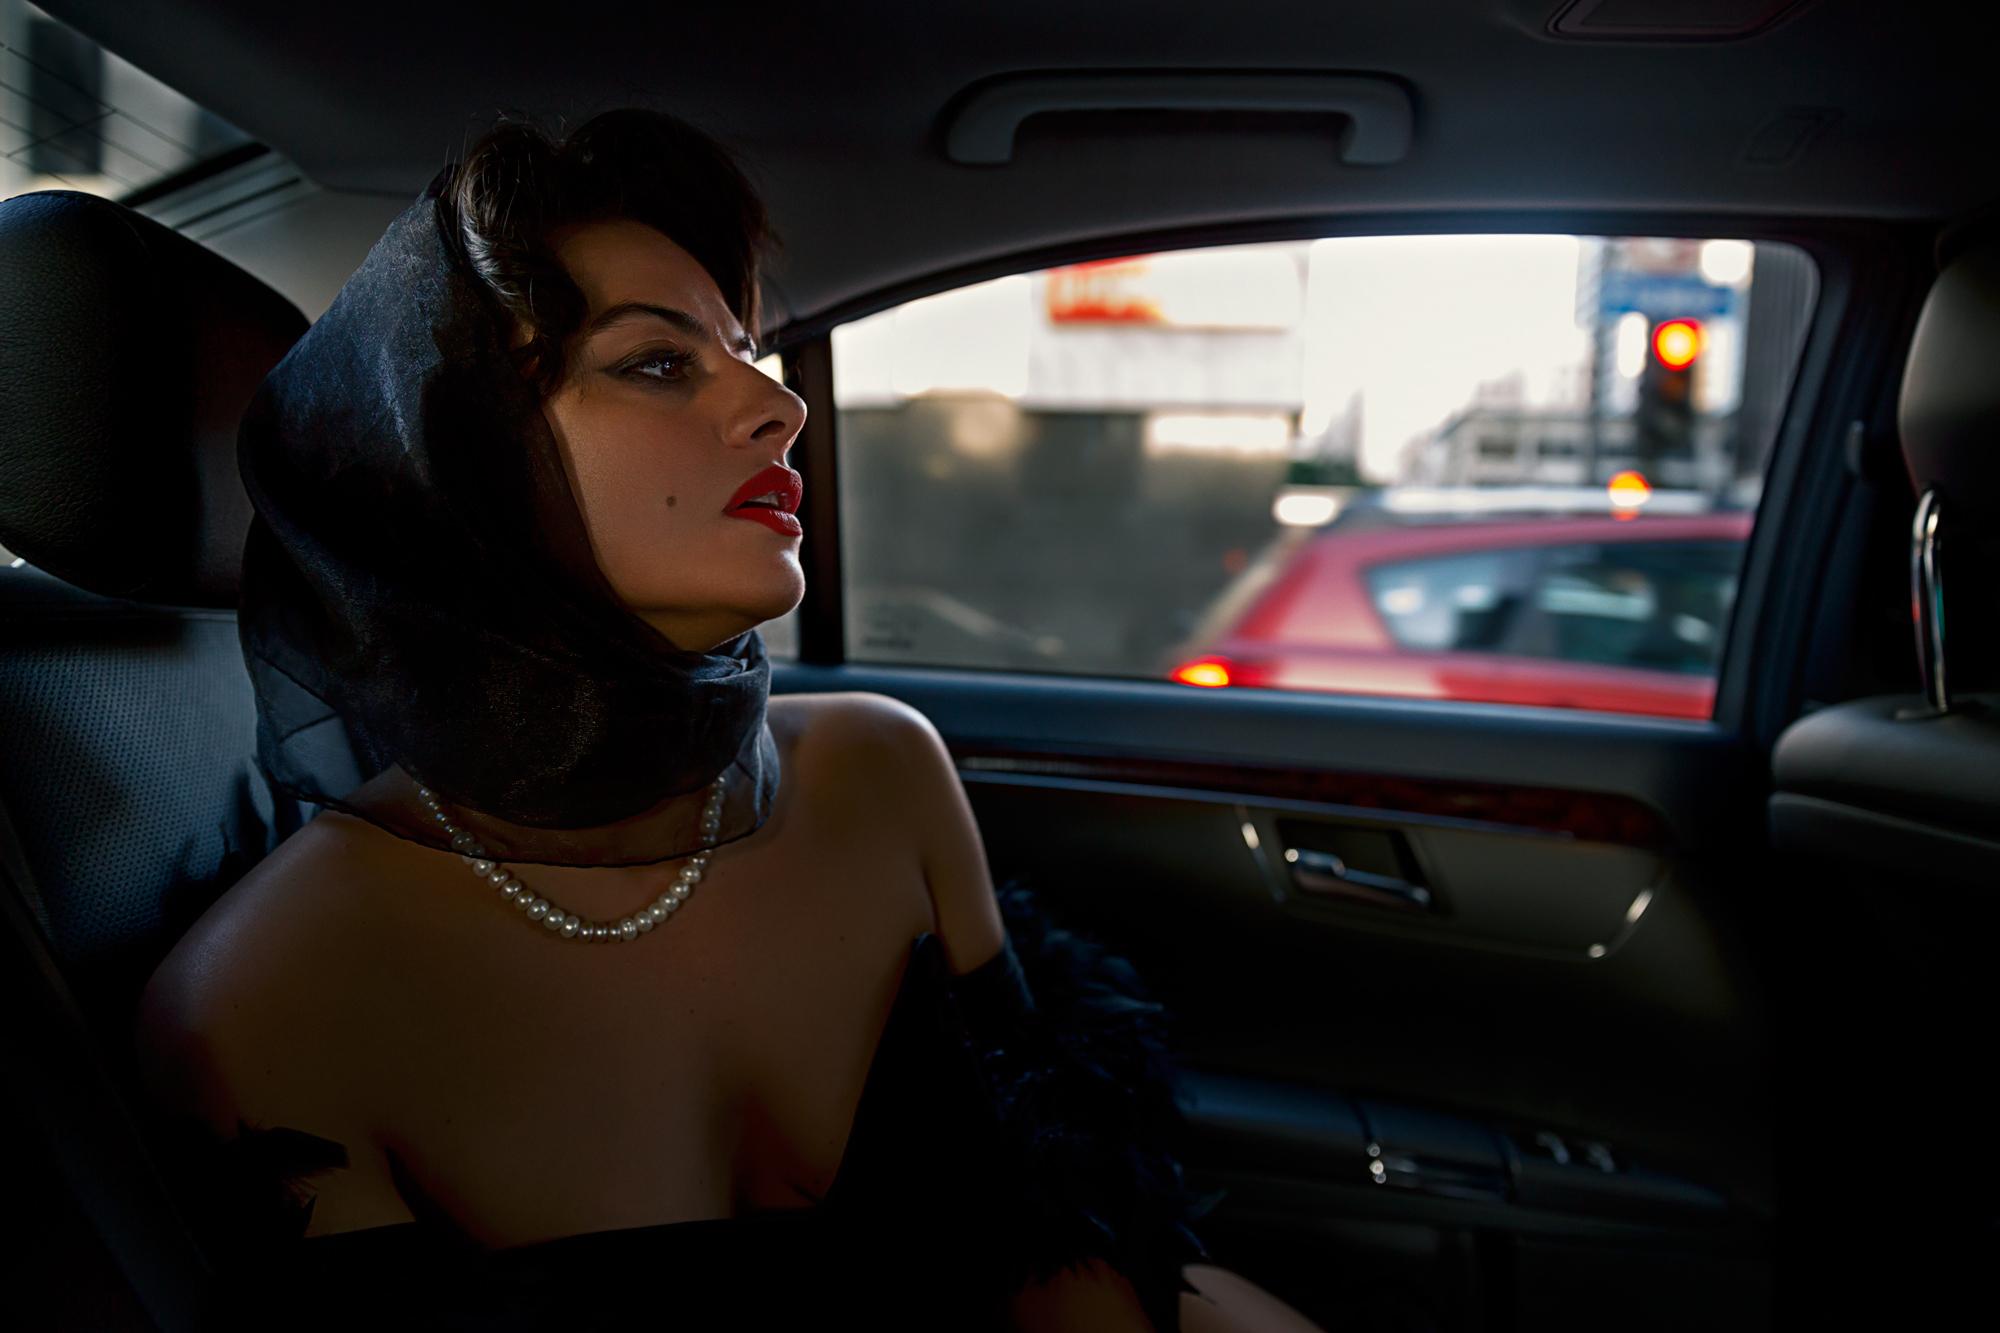 Photographer - Victor Huber  Location - Los Angeles